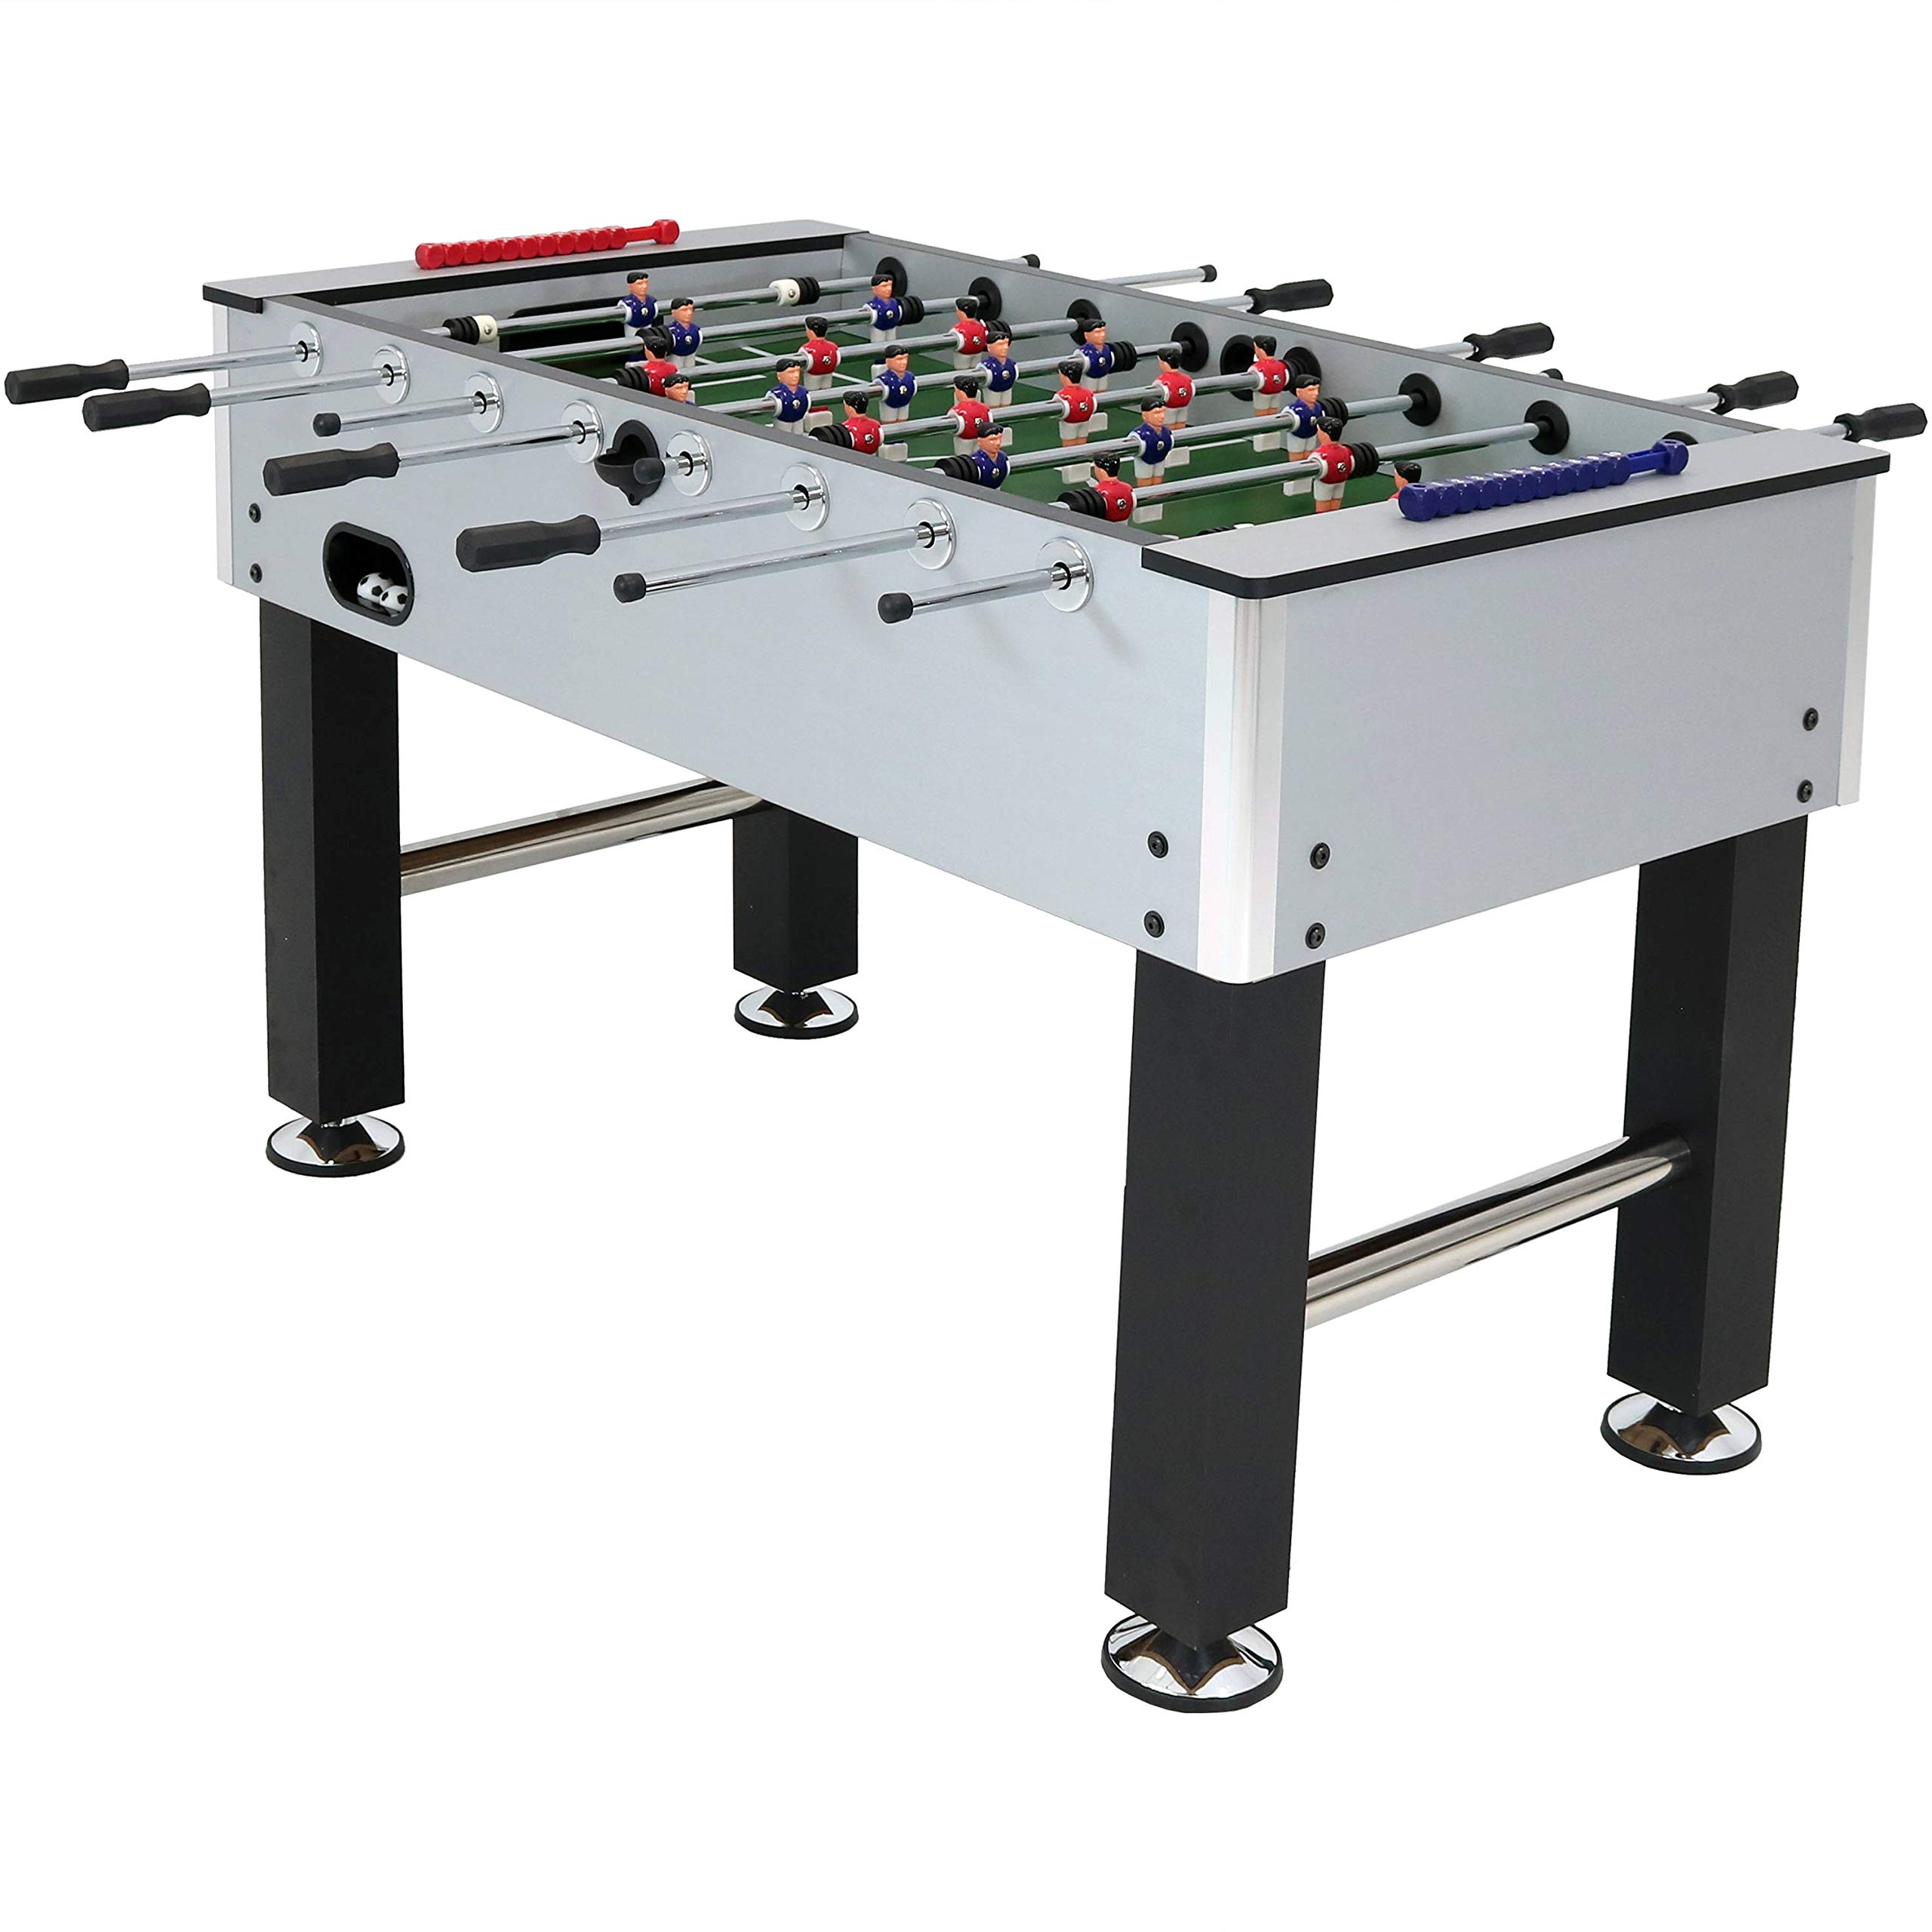 Sunnydaze Metallic Foosball Table, Sports Arcade Soccer for Game Room - 55-Inch by Sunnydaze Decor